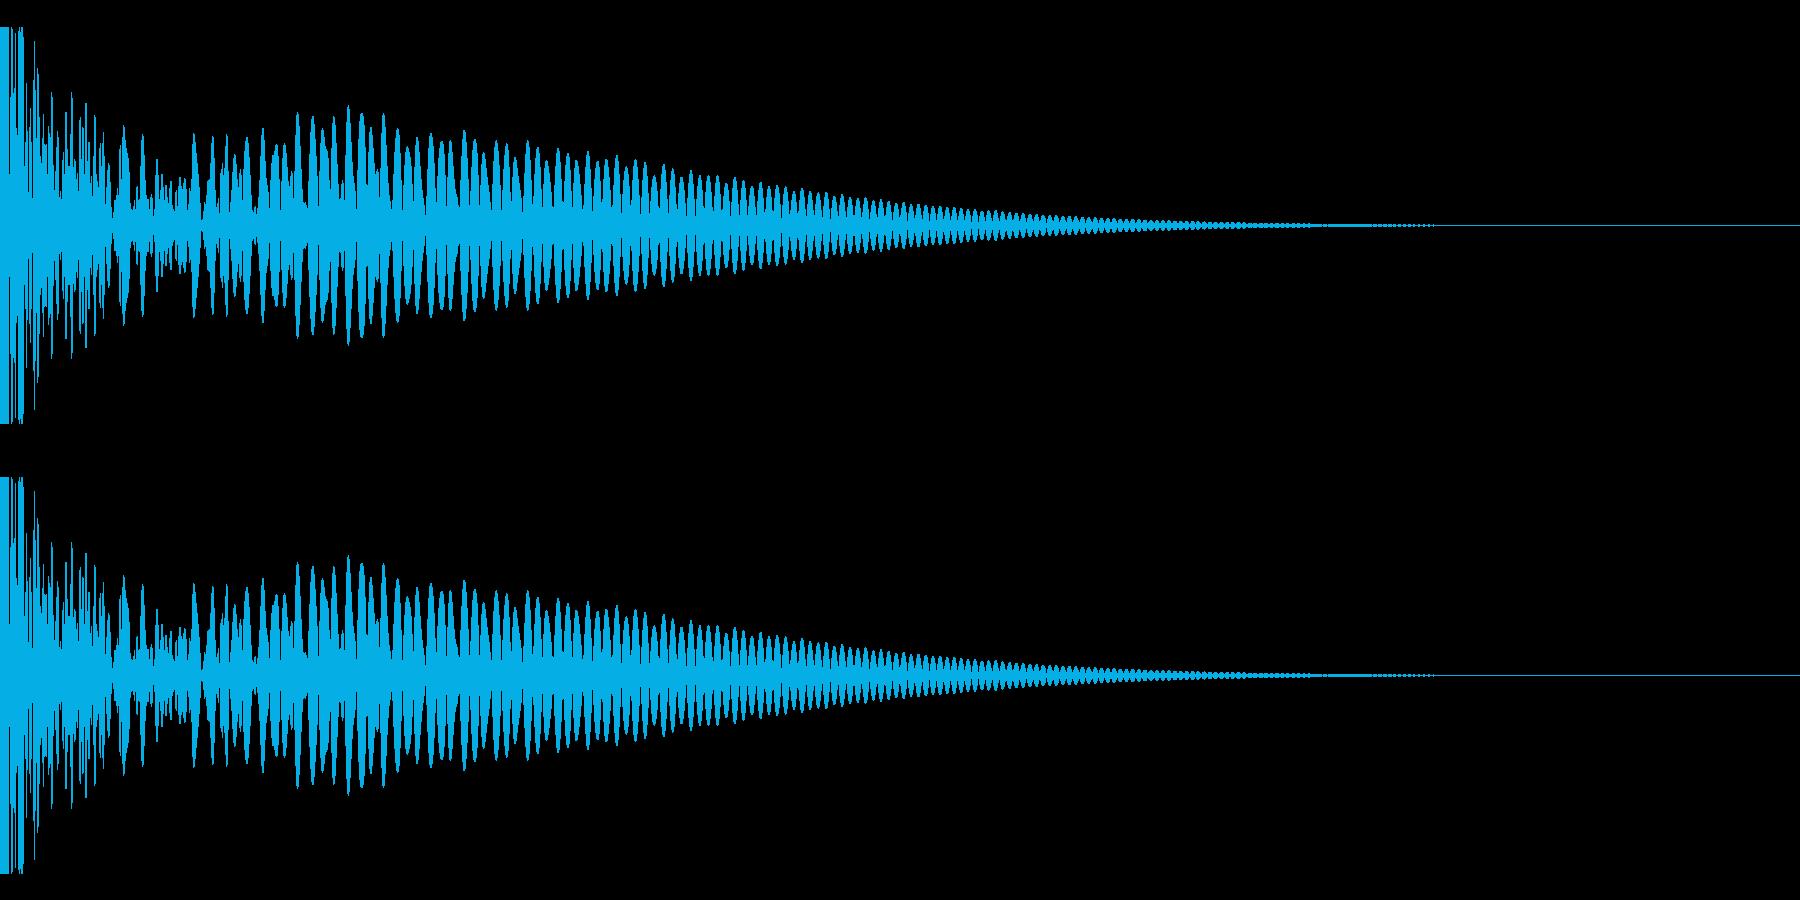 DTM Tom 34 オリジナル音源の再生済みの波形